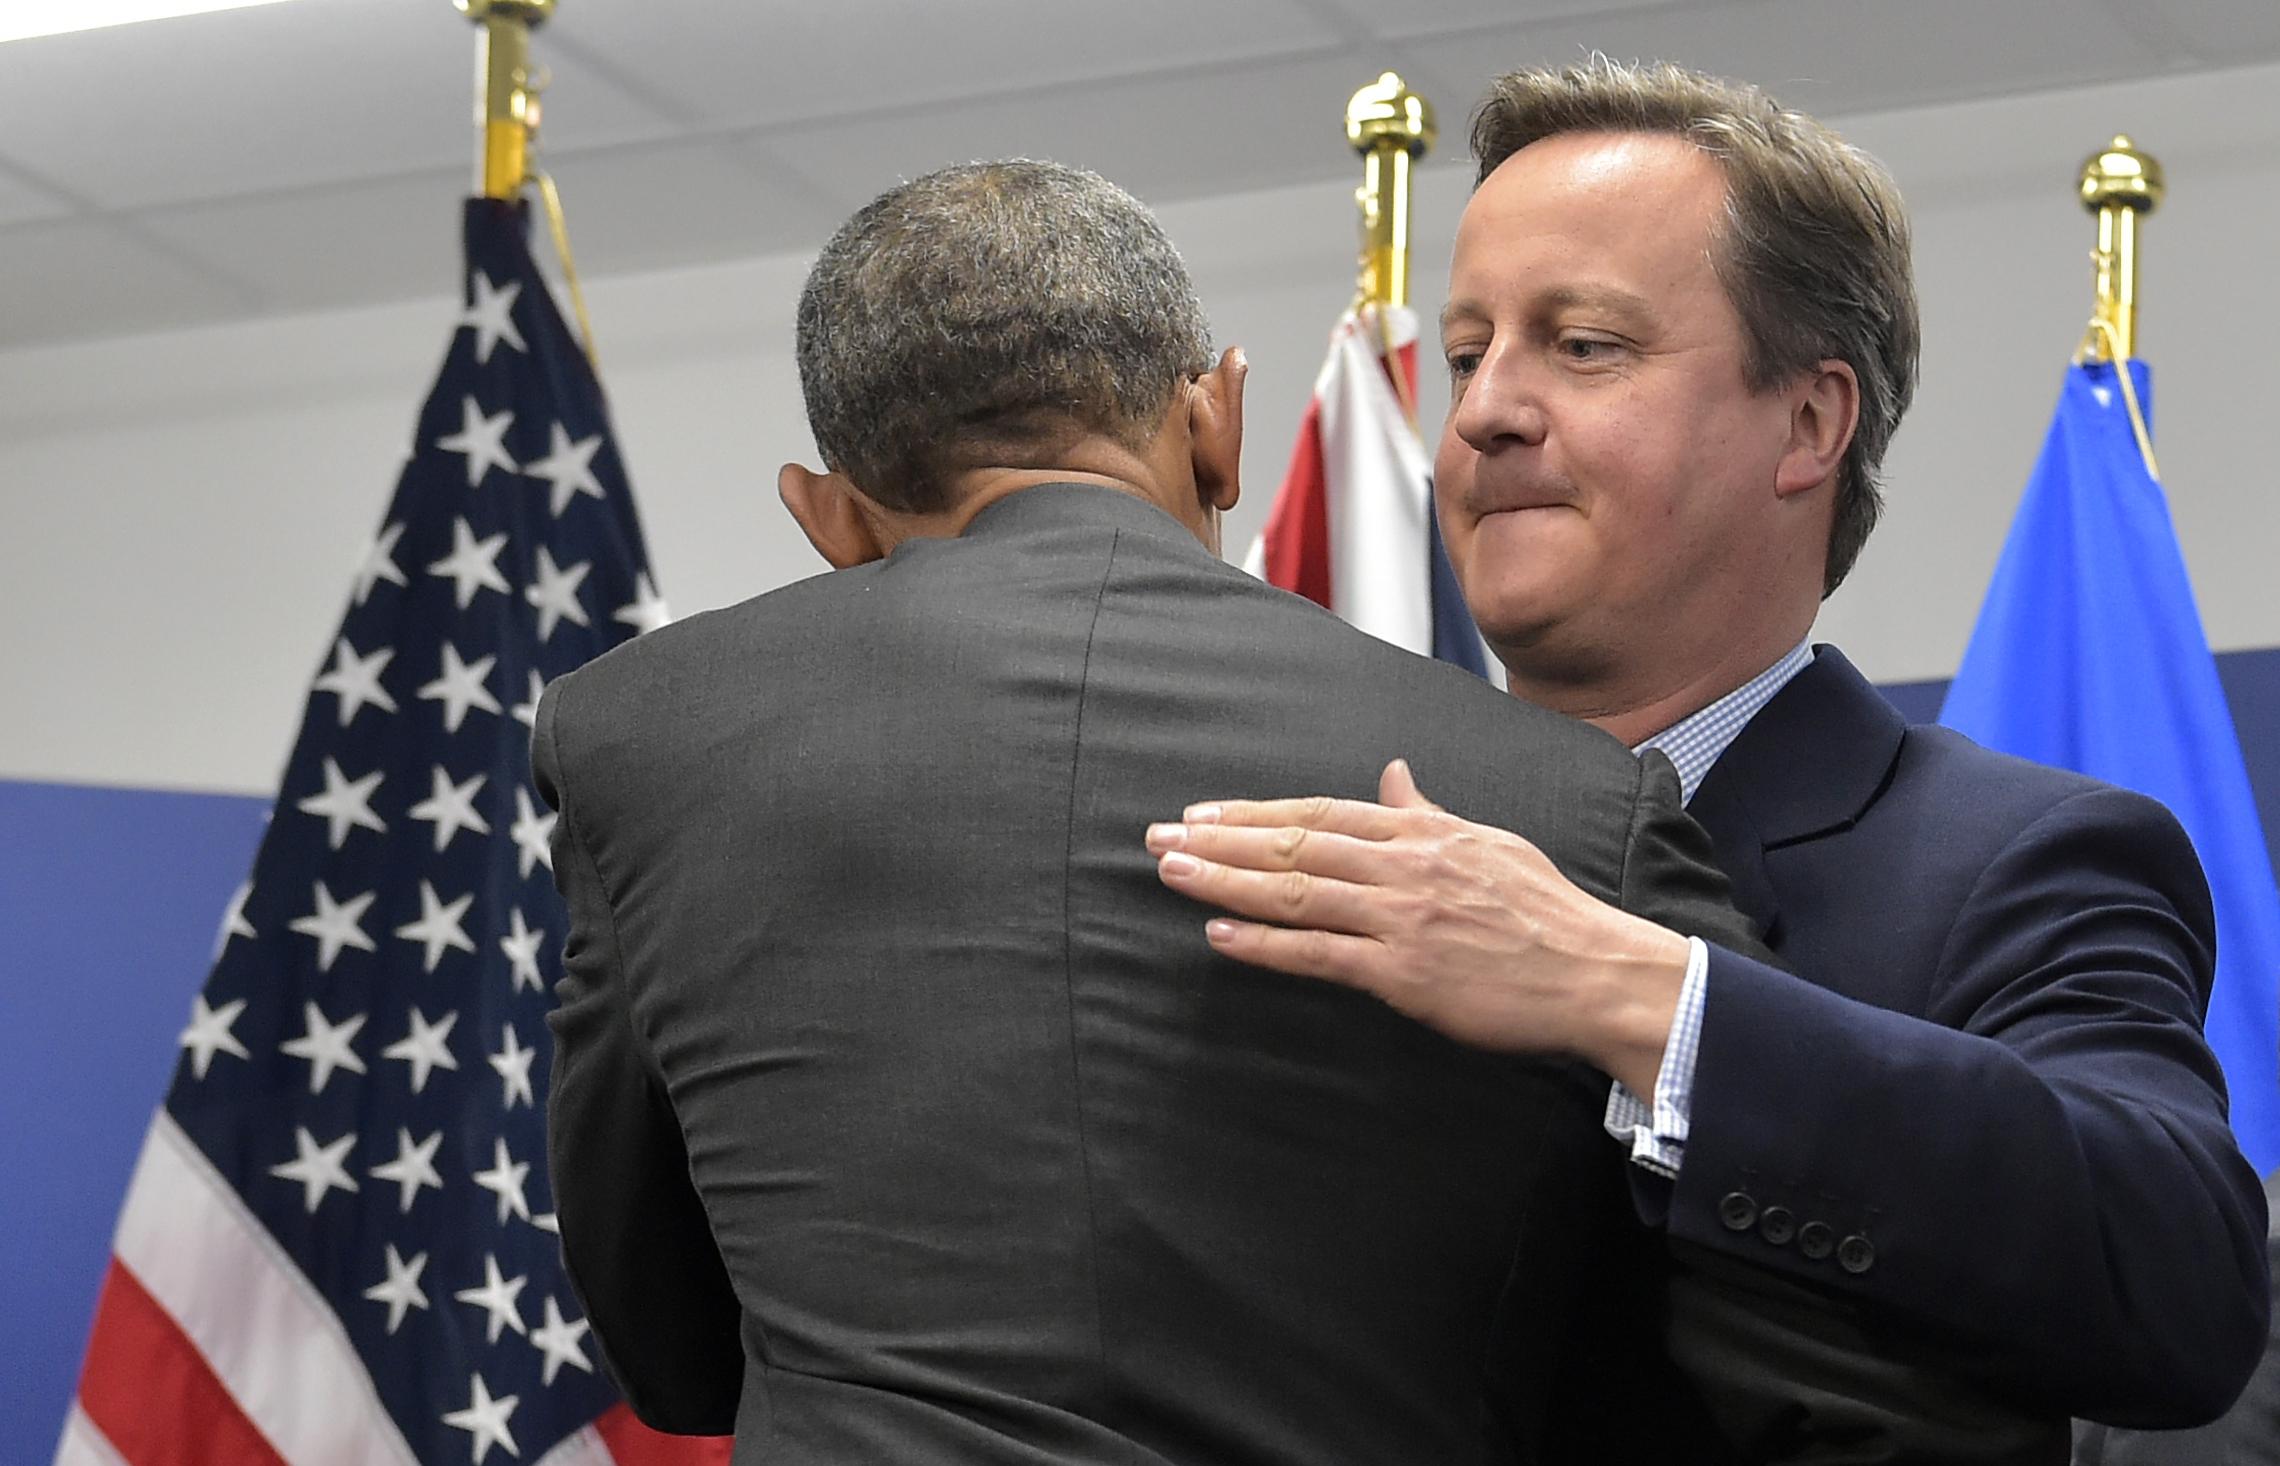 David Cameron állítólag NATO-főtitkár lenne